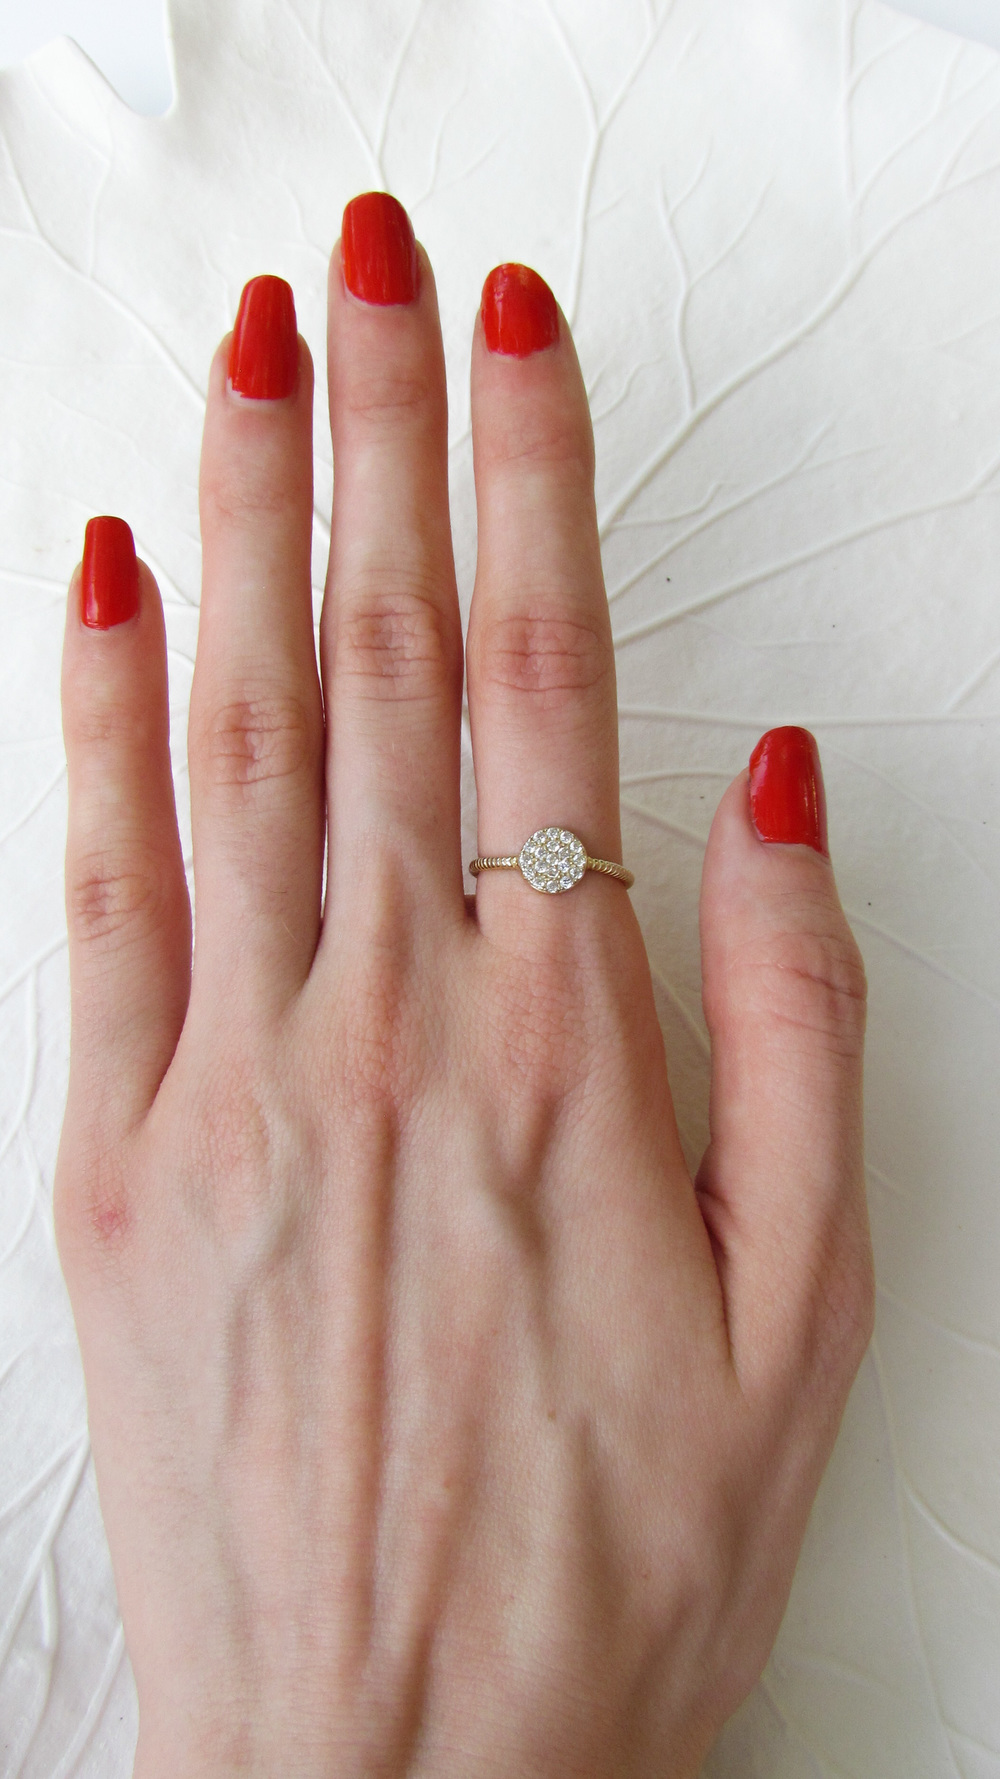 Moon & Lola Ring Lixa Ring - Rocksbox - Southern New Yorker